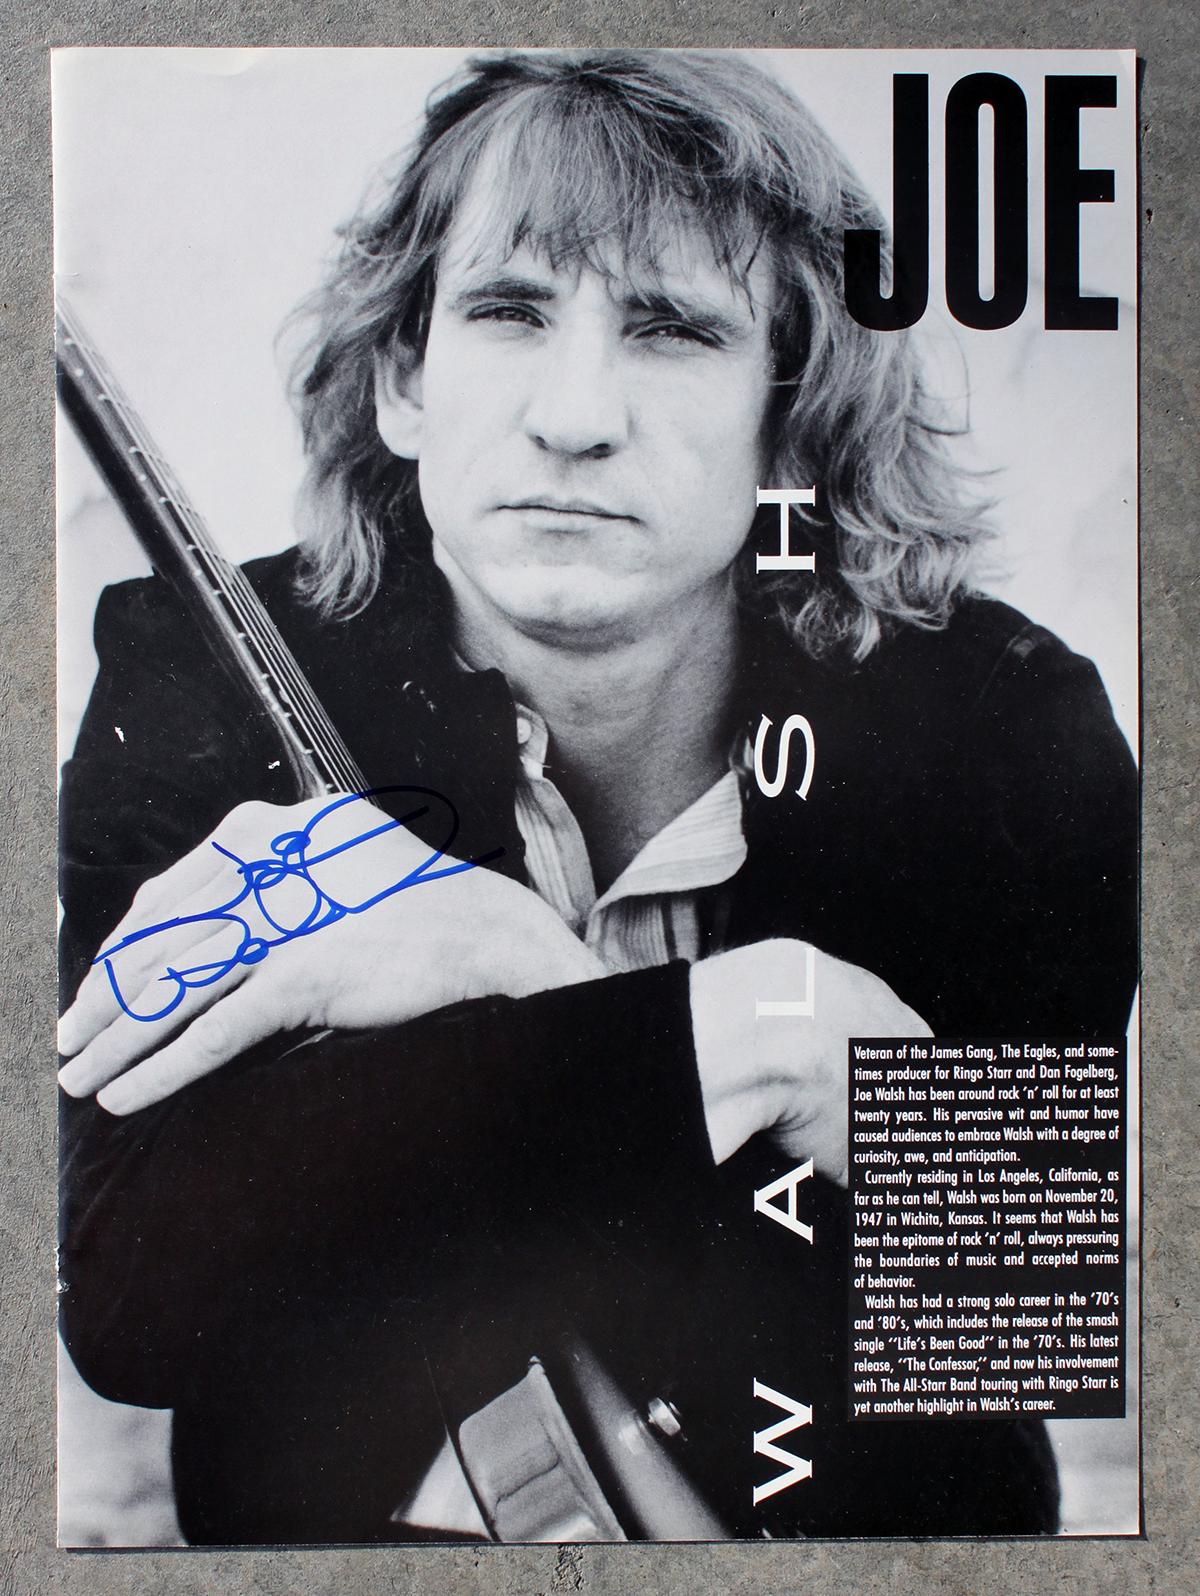 Joe Walsh photo #2